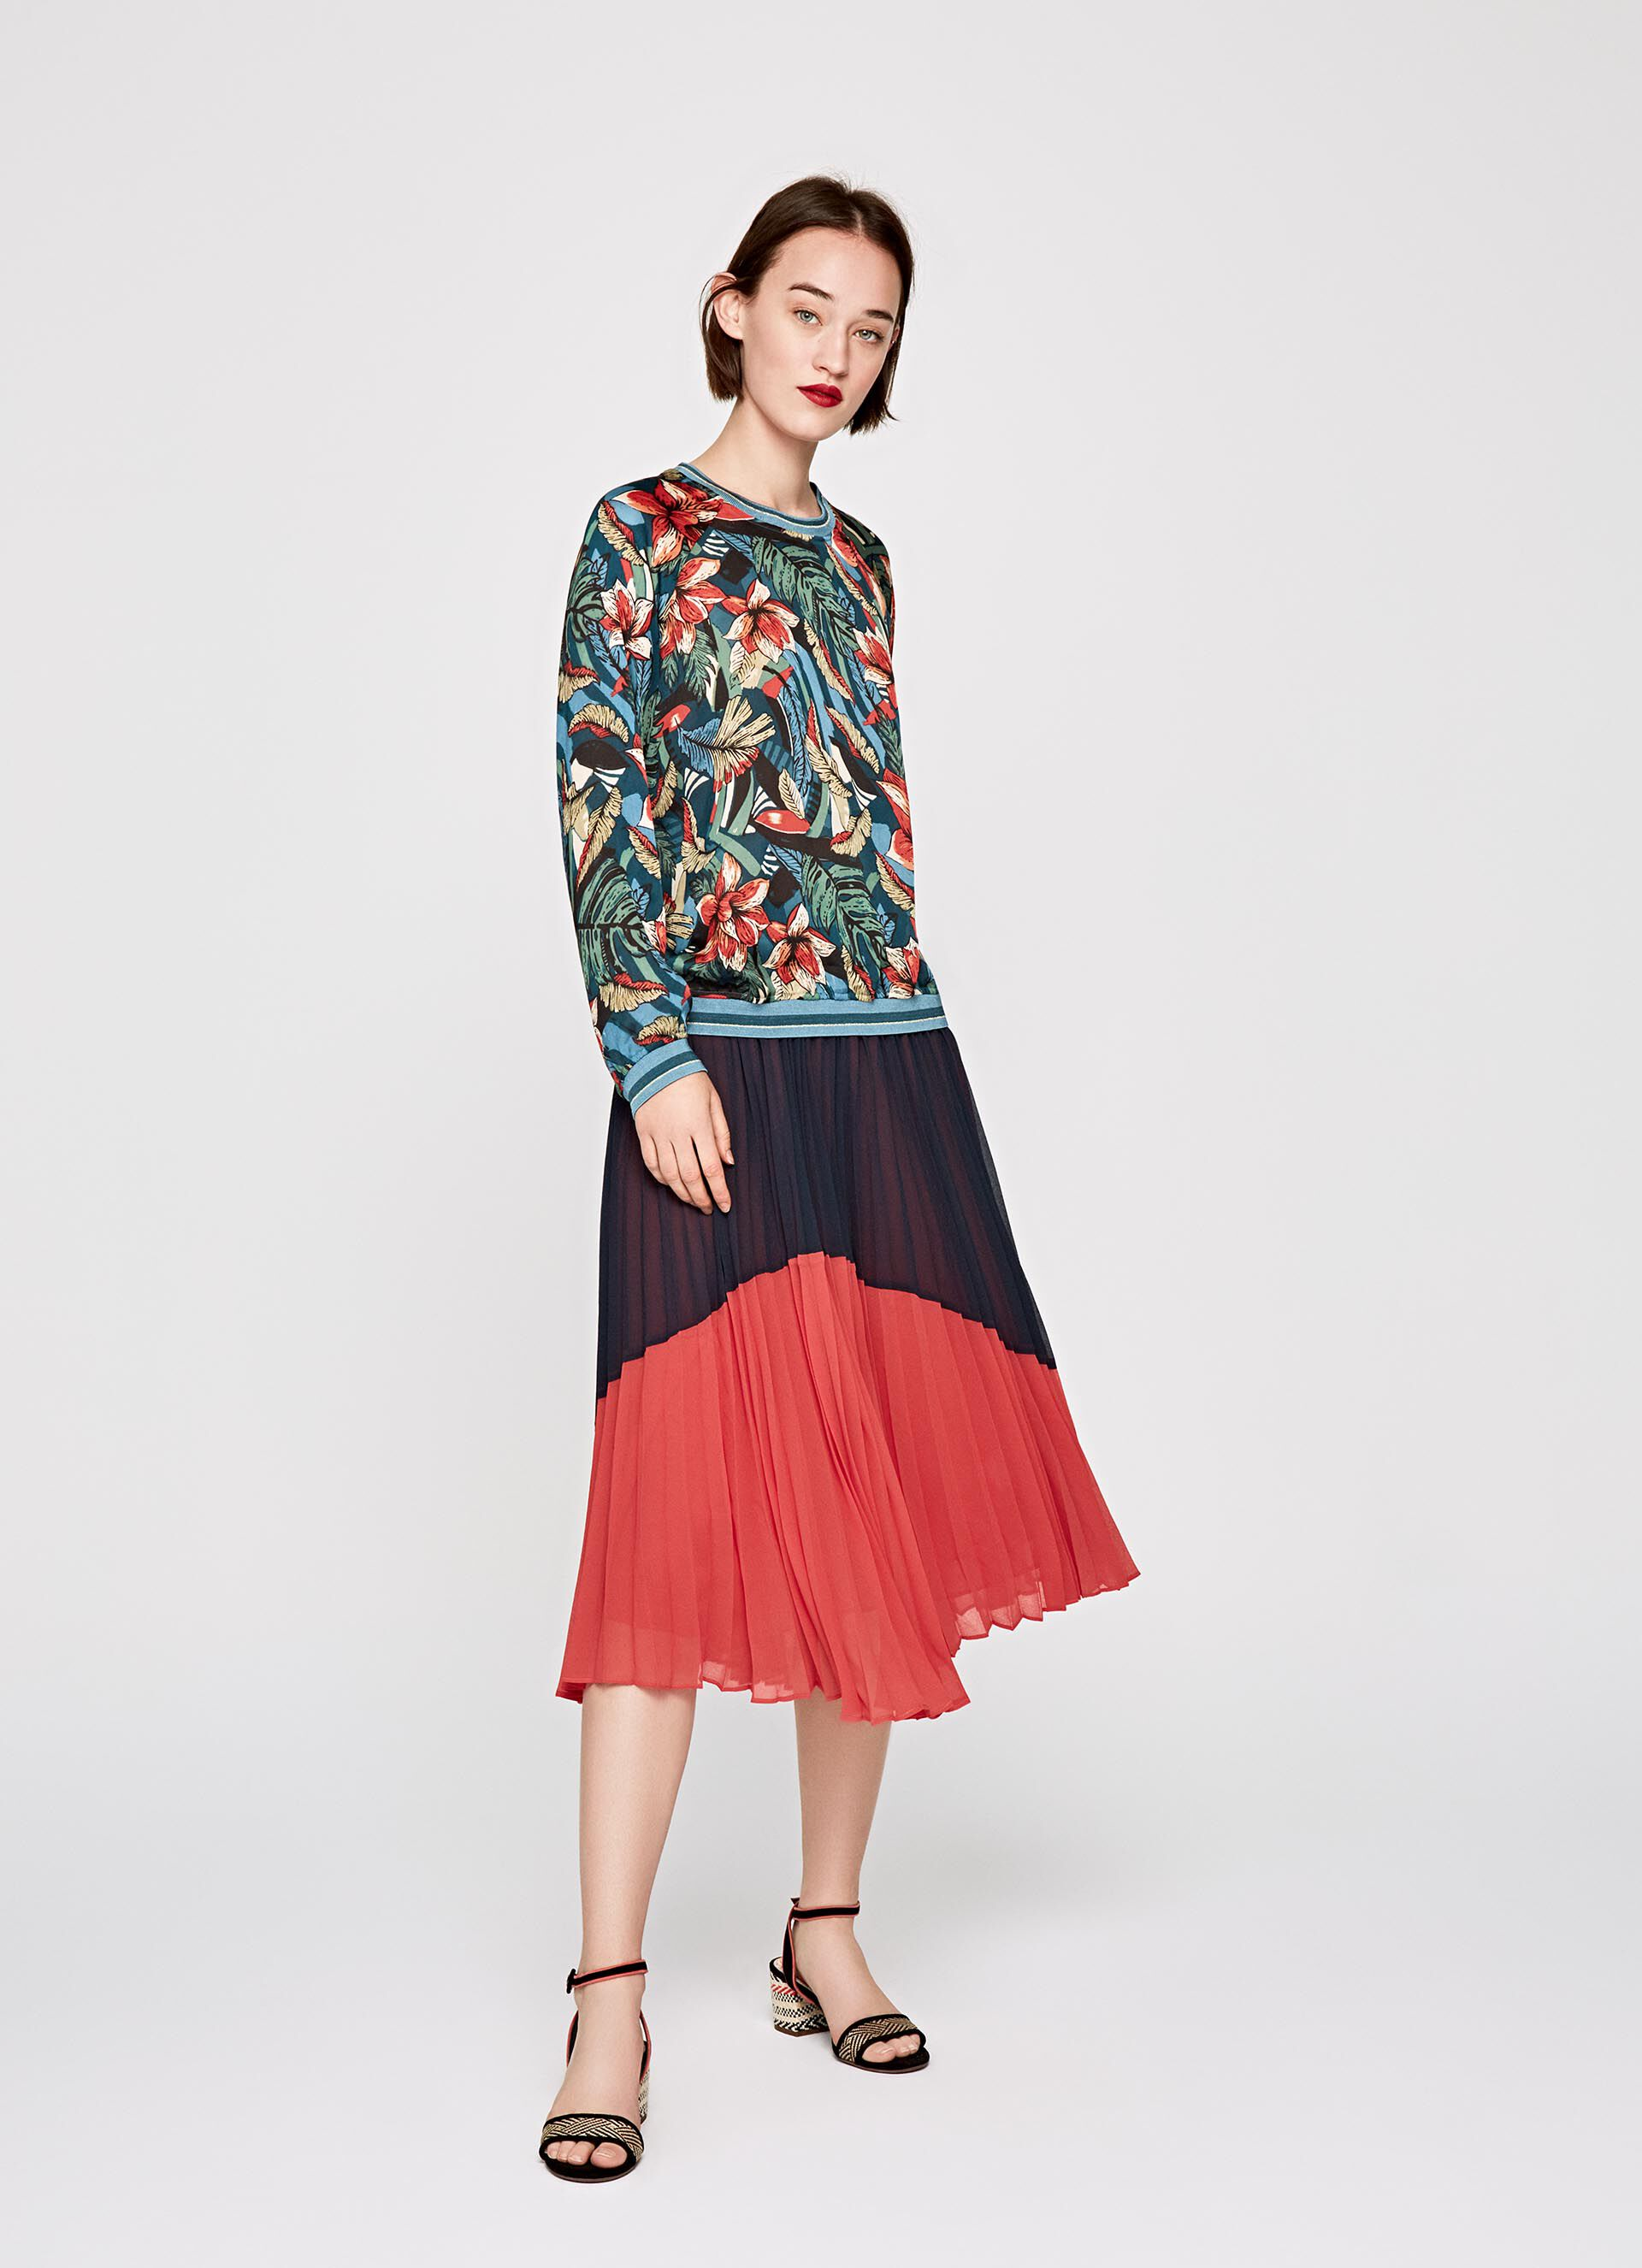 Style Blouse Blouse Style Frances Sweatshirt Sweatshirt mvN0wn8